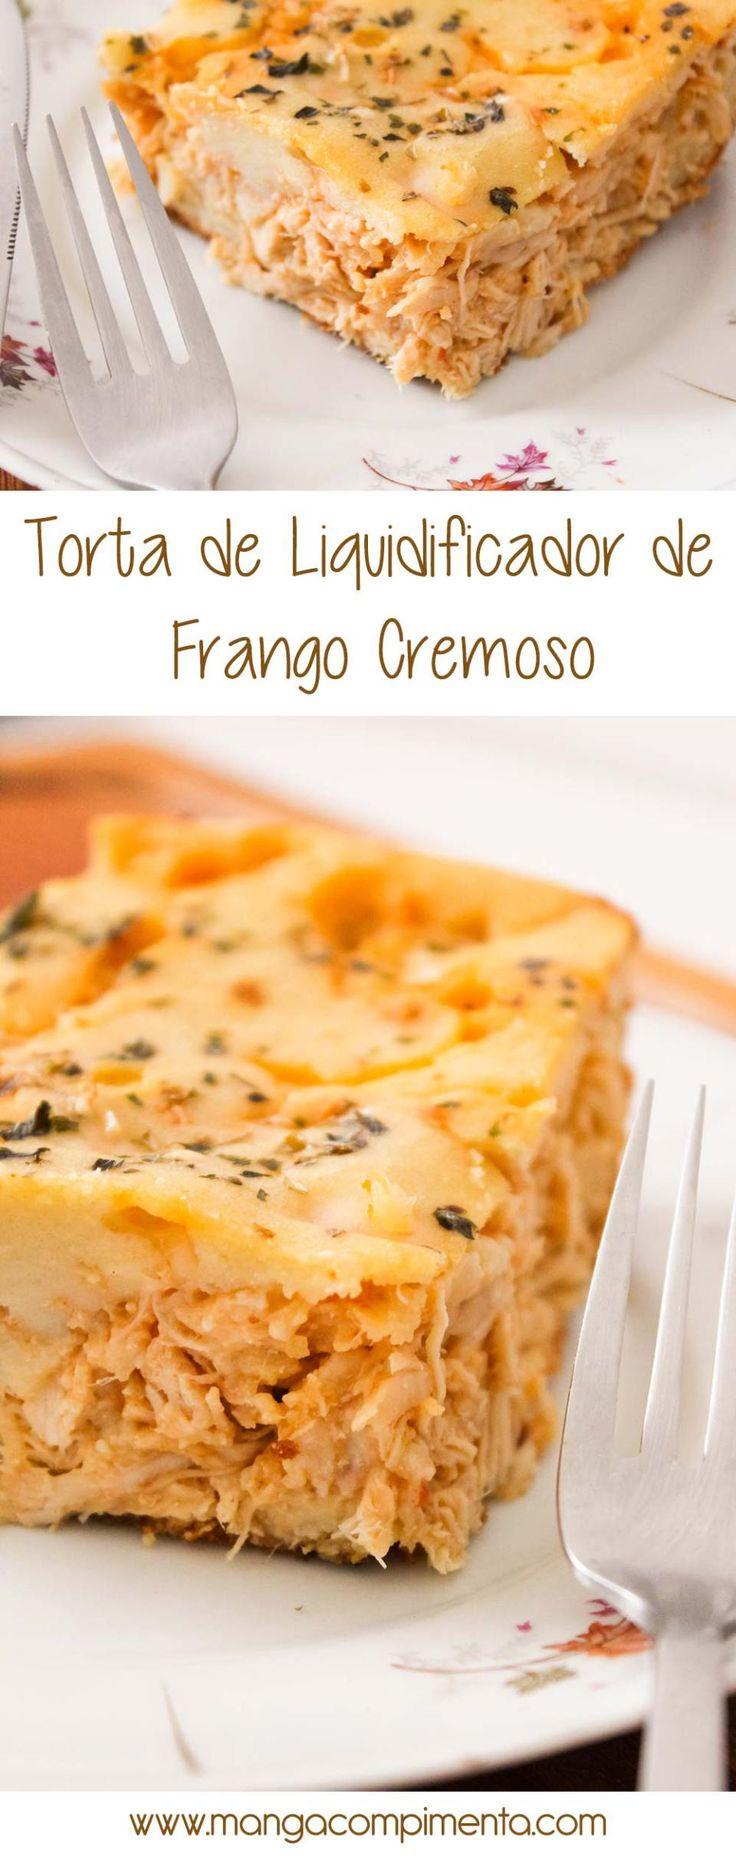 Torta de Liquidificador de Frango Cremoso - para um almoço leve nos dias quentes! #receita #comida #torta